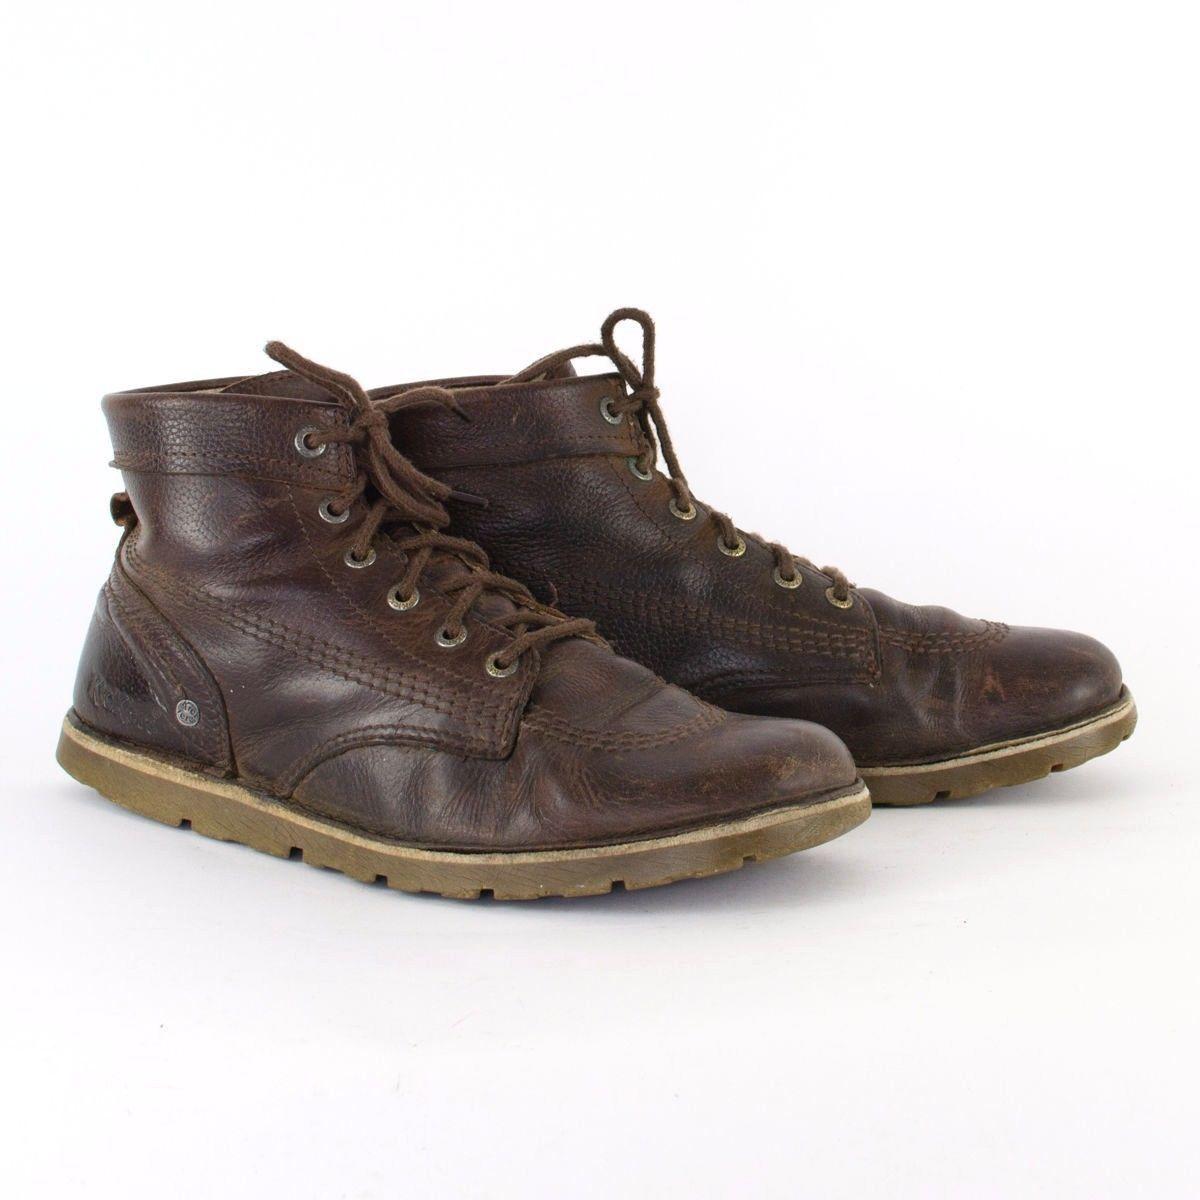 Vintage 1990s 90s Mens Brown Leather